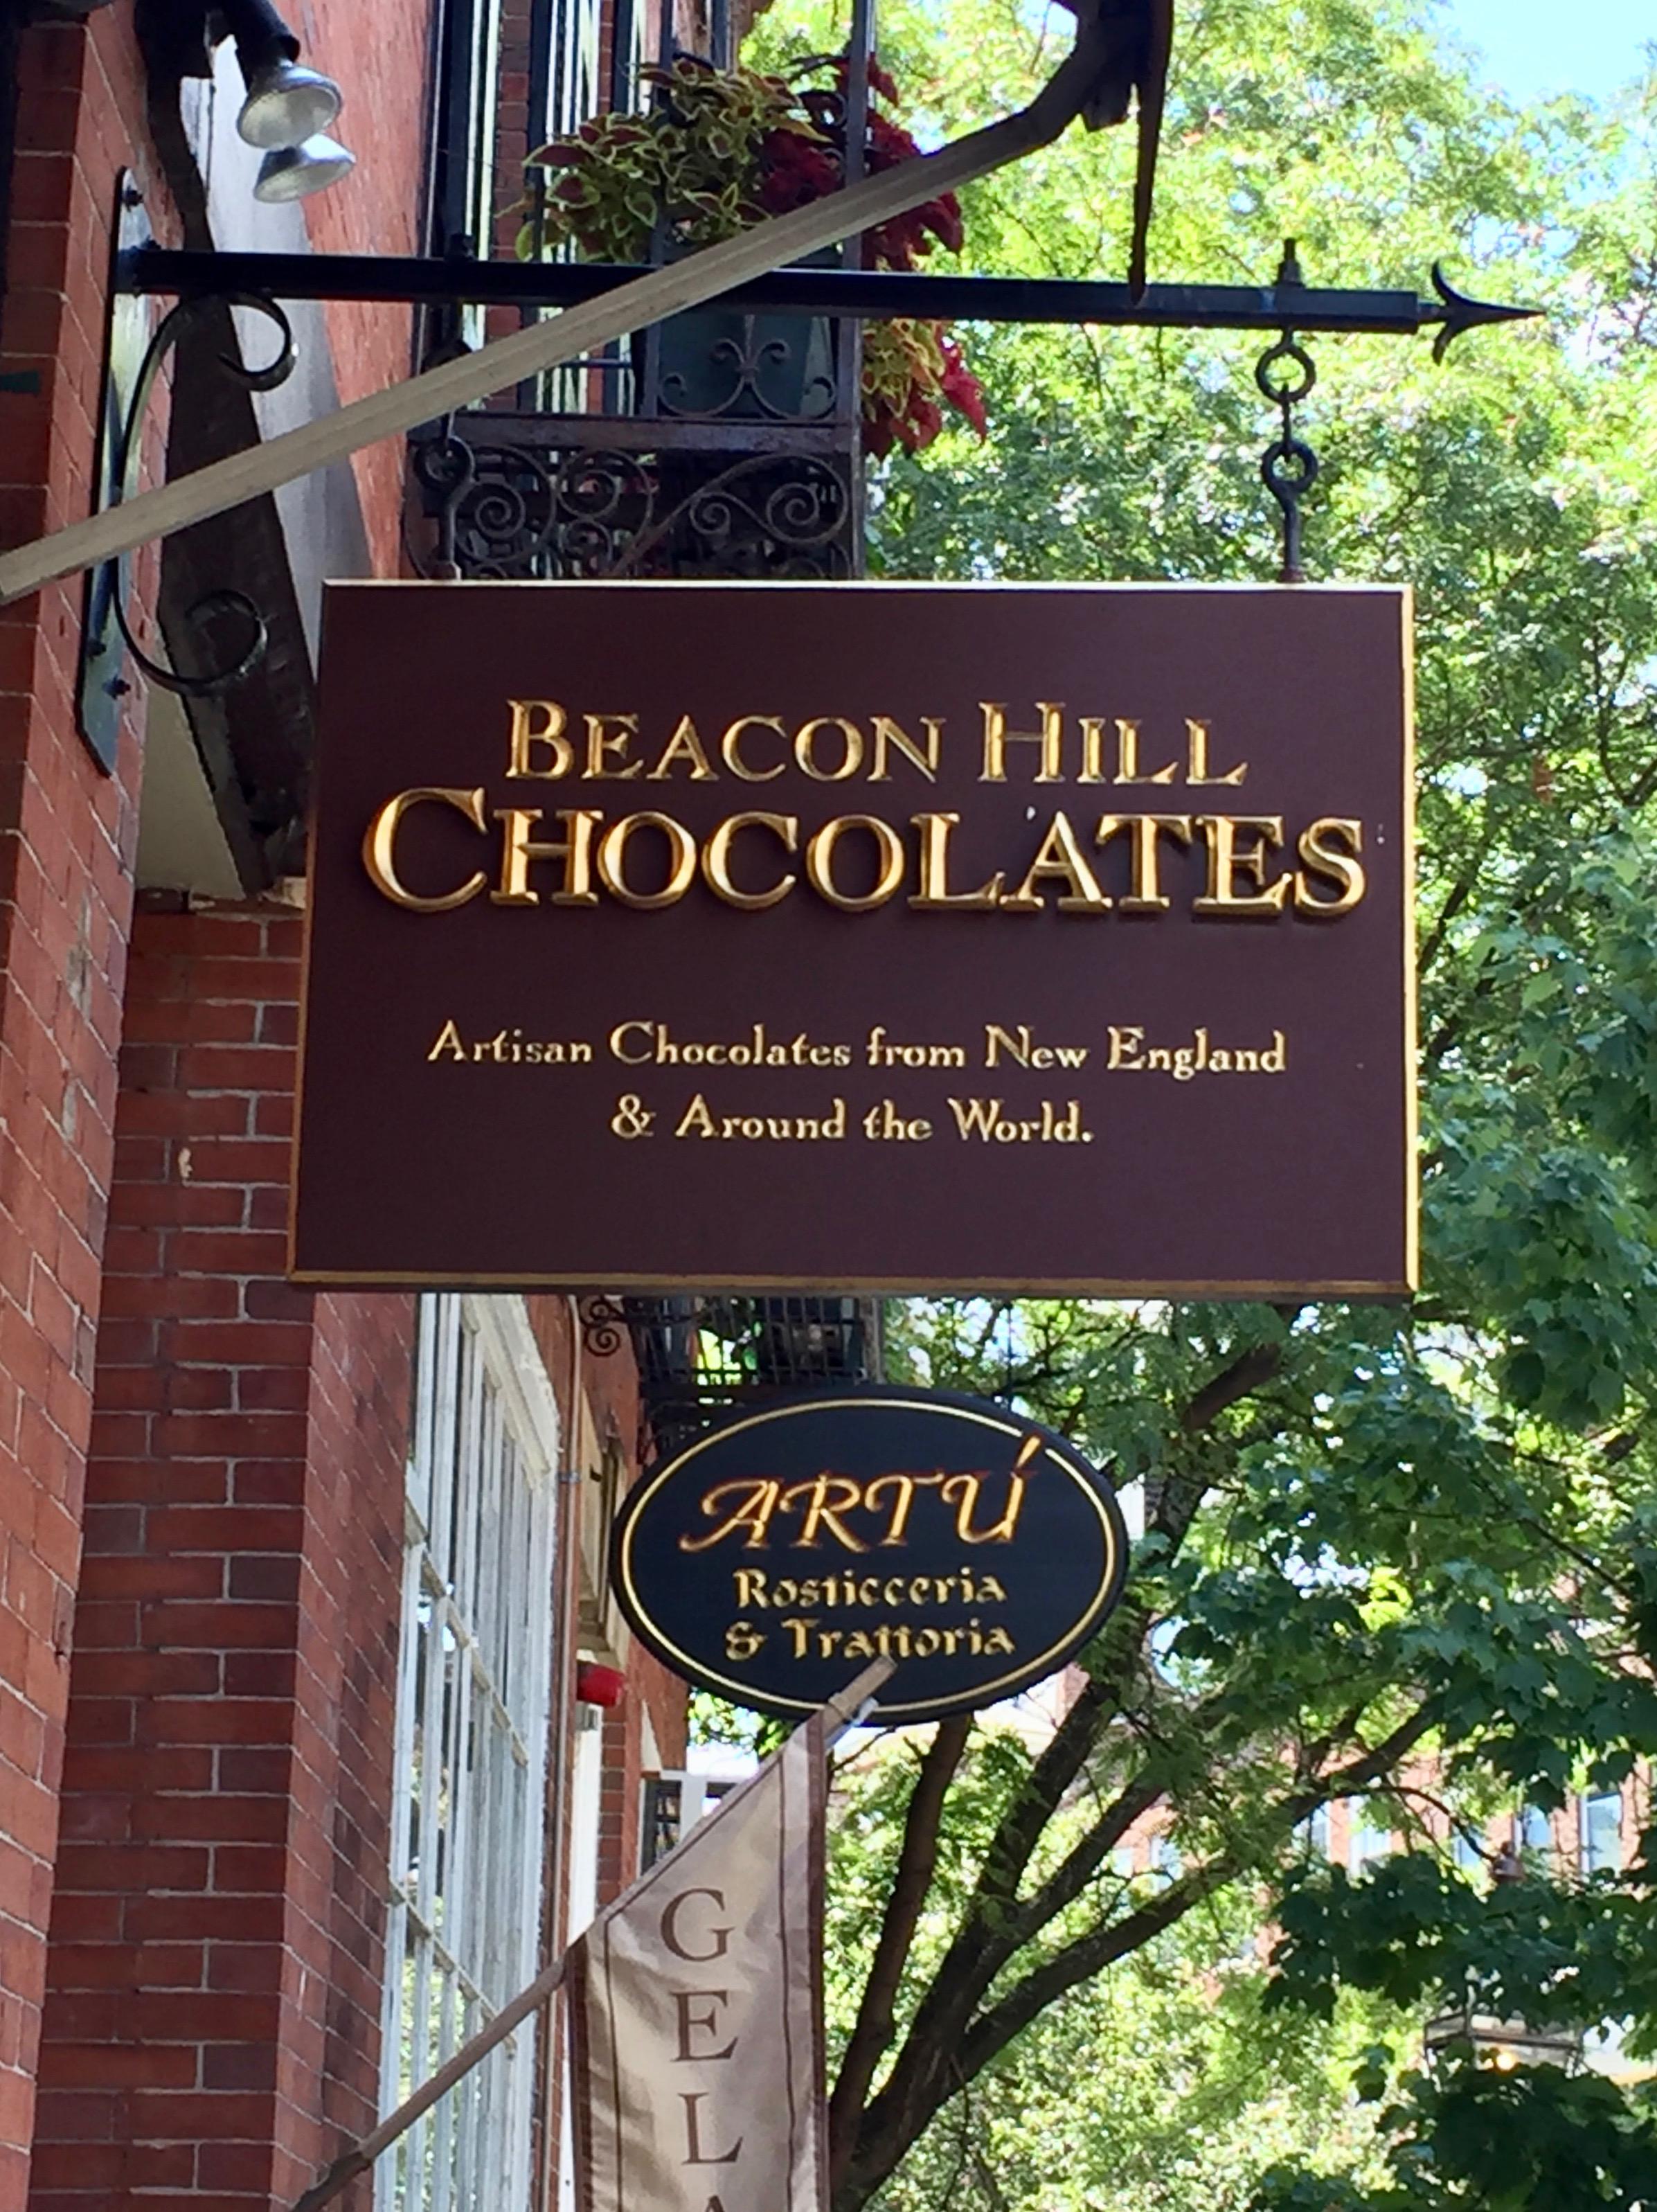 Beacon Hill Chocolates